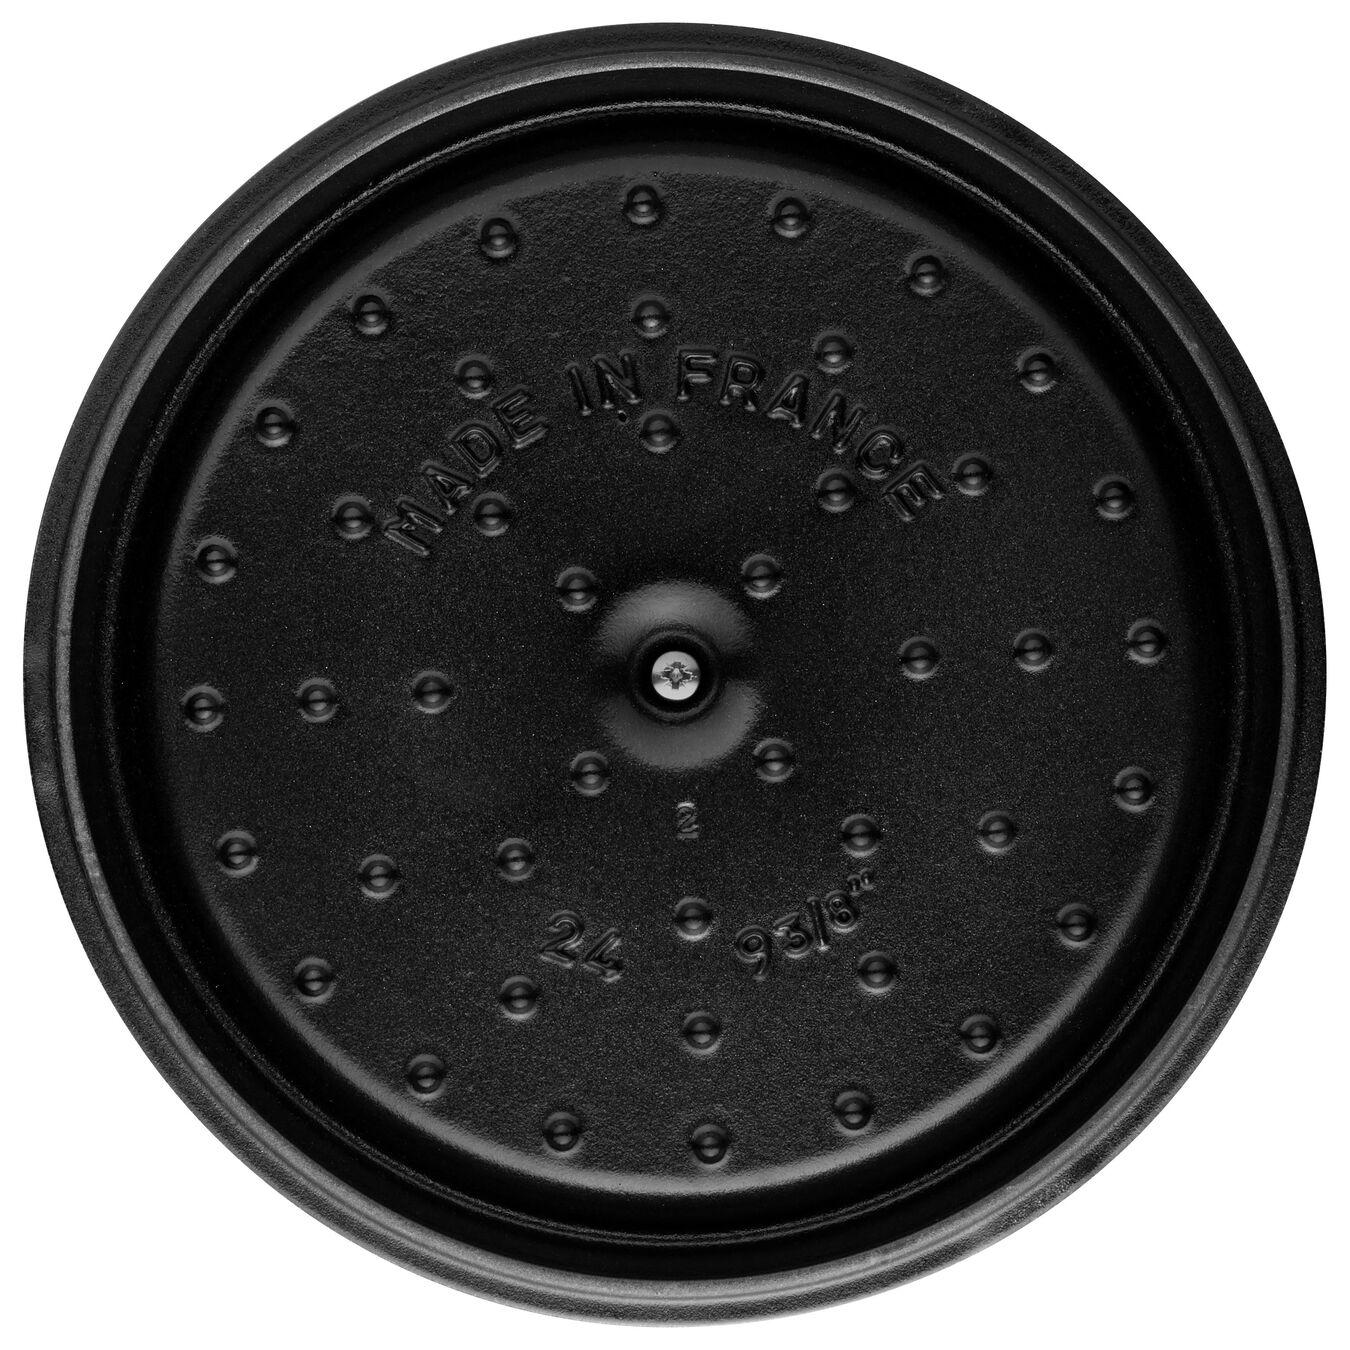 Cocotte 24 cm, rund, La-Mer, Gusseisen,,large 6